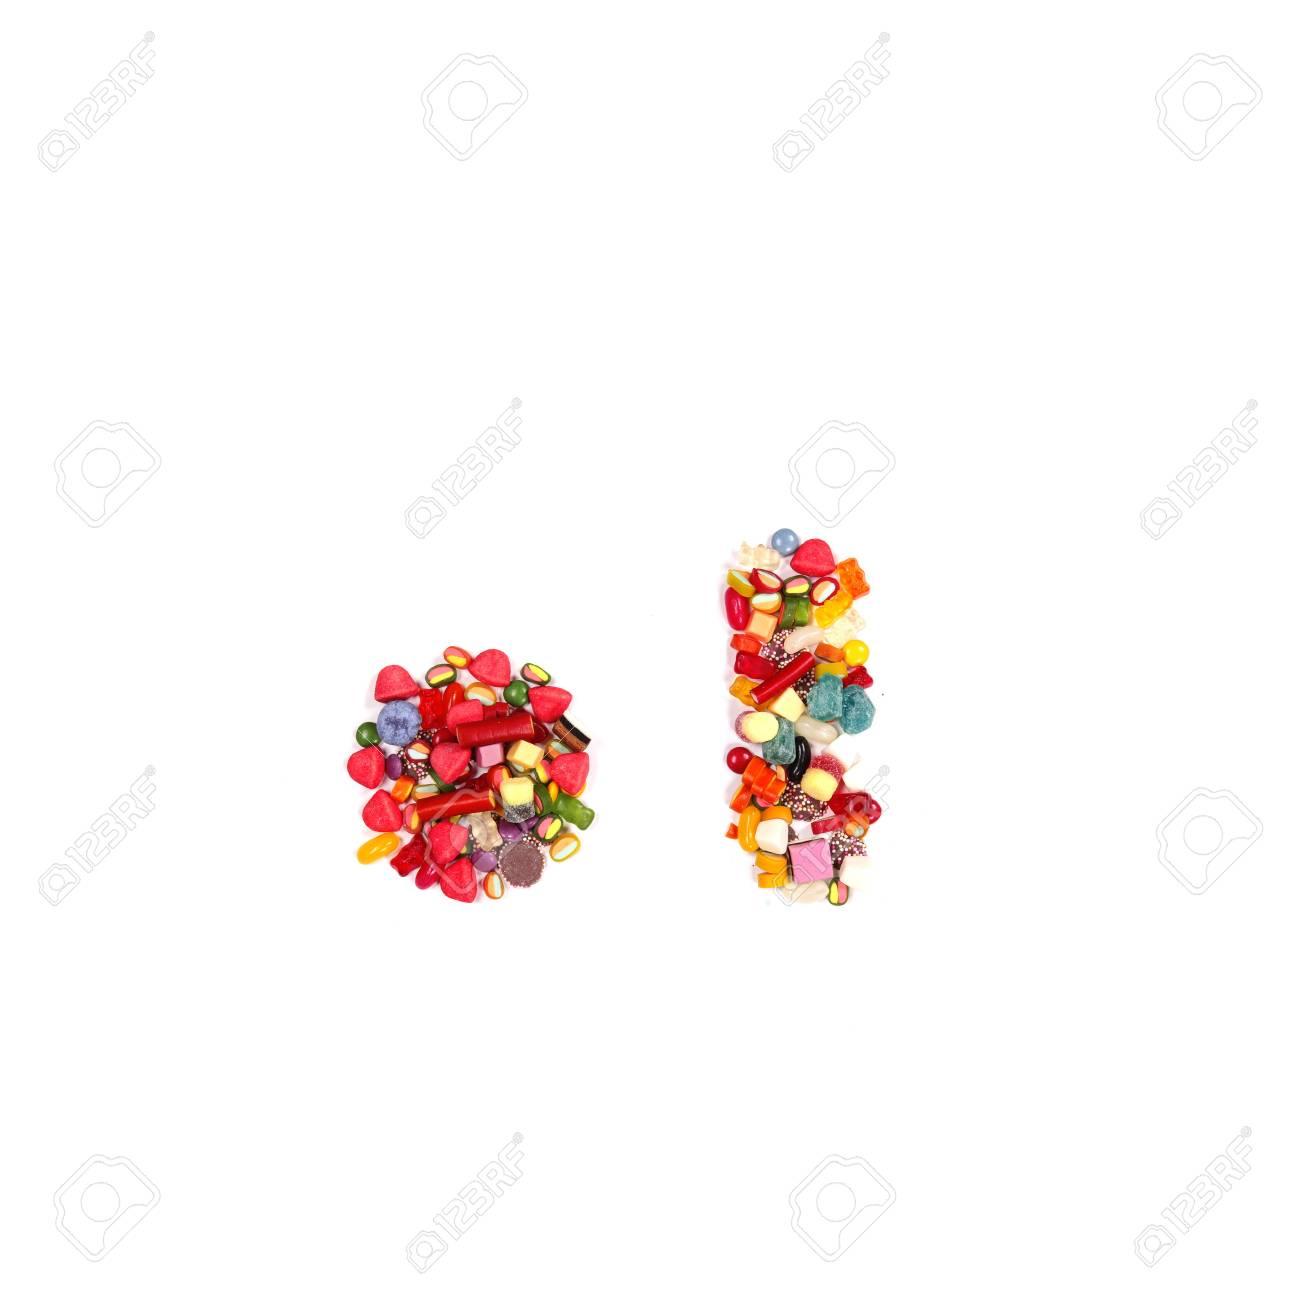 Candy alphabet font Stock Photo - 14864267